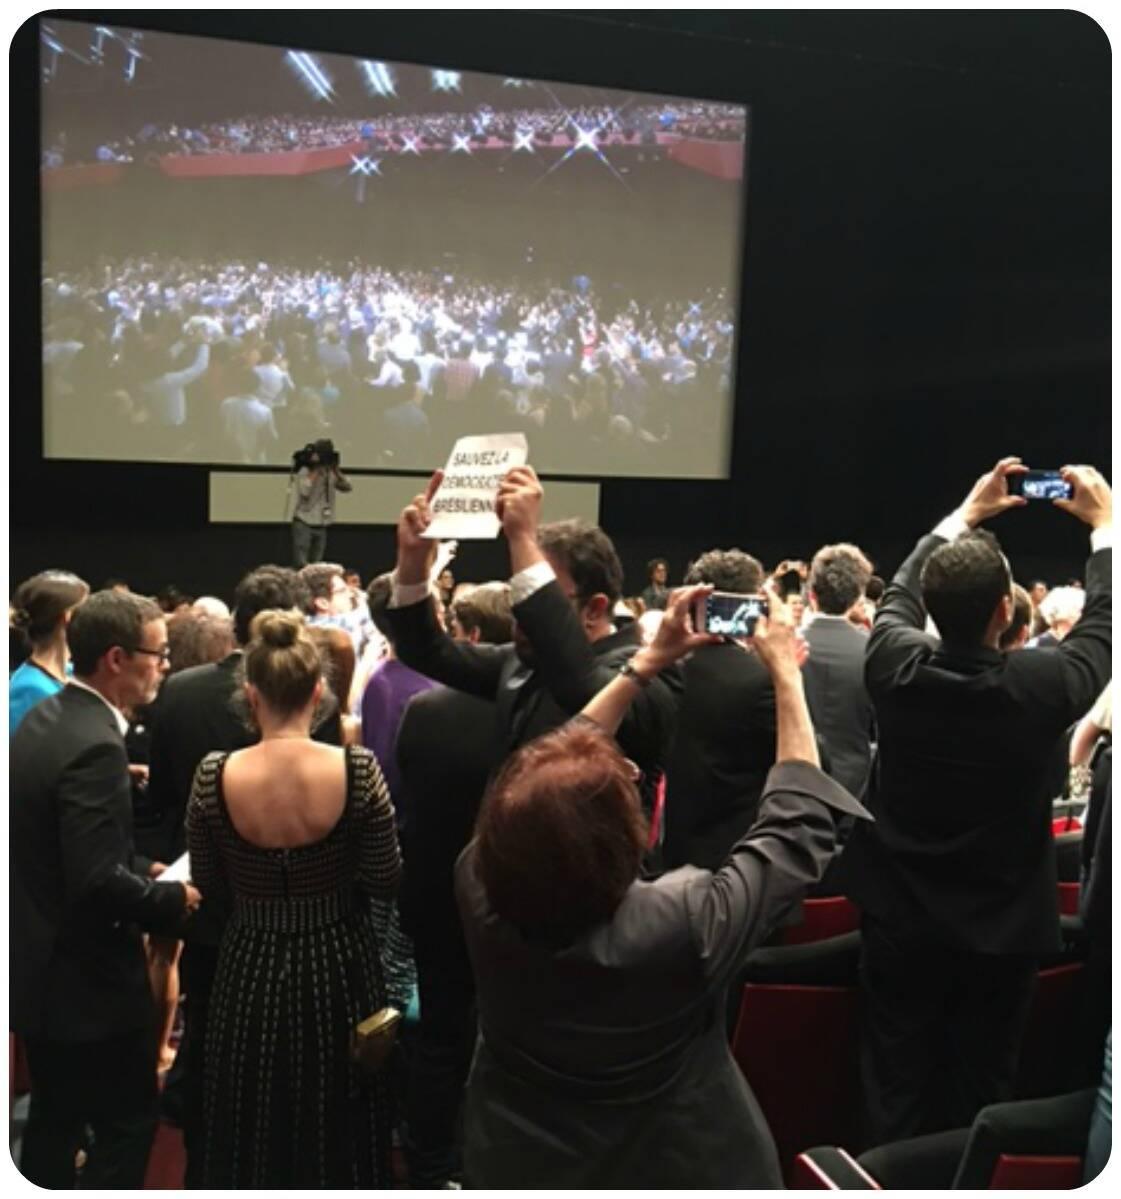 Momento de protestos contra o governo brasileiro no Festival